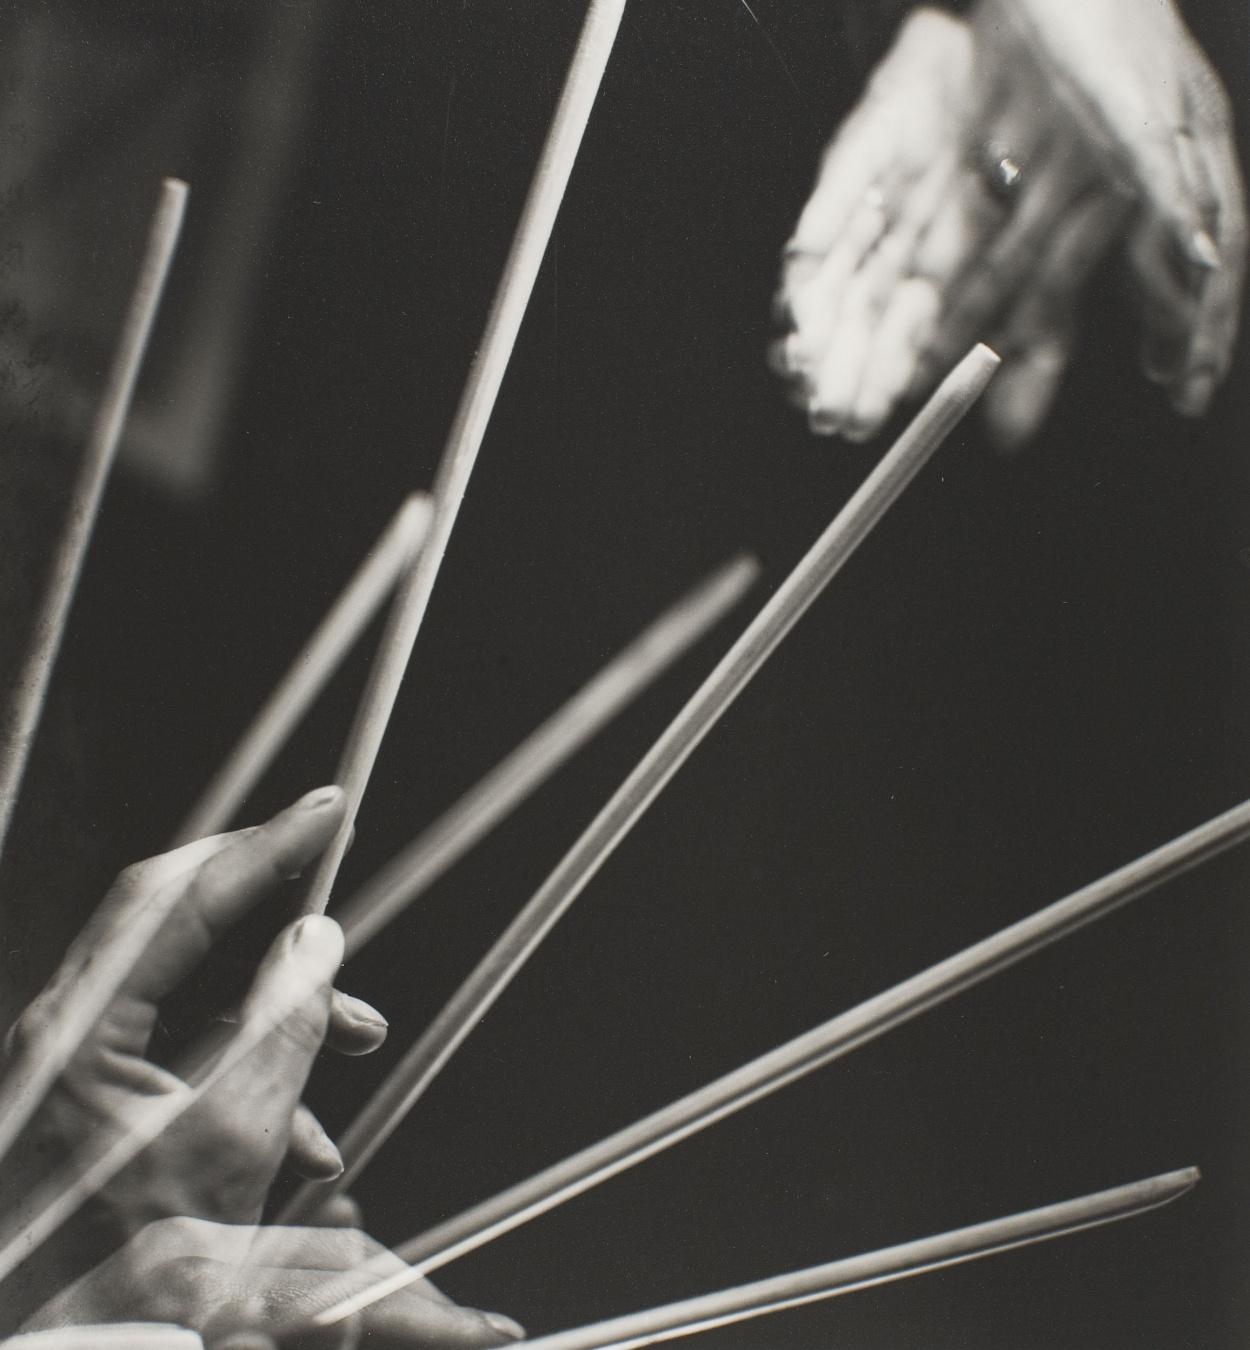 Josep Maria Lladó - Untitled - Circa 1930-1934 (print run 1997)